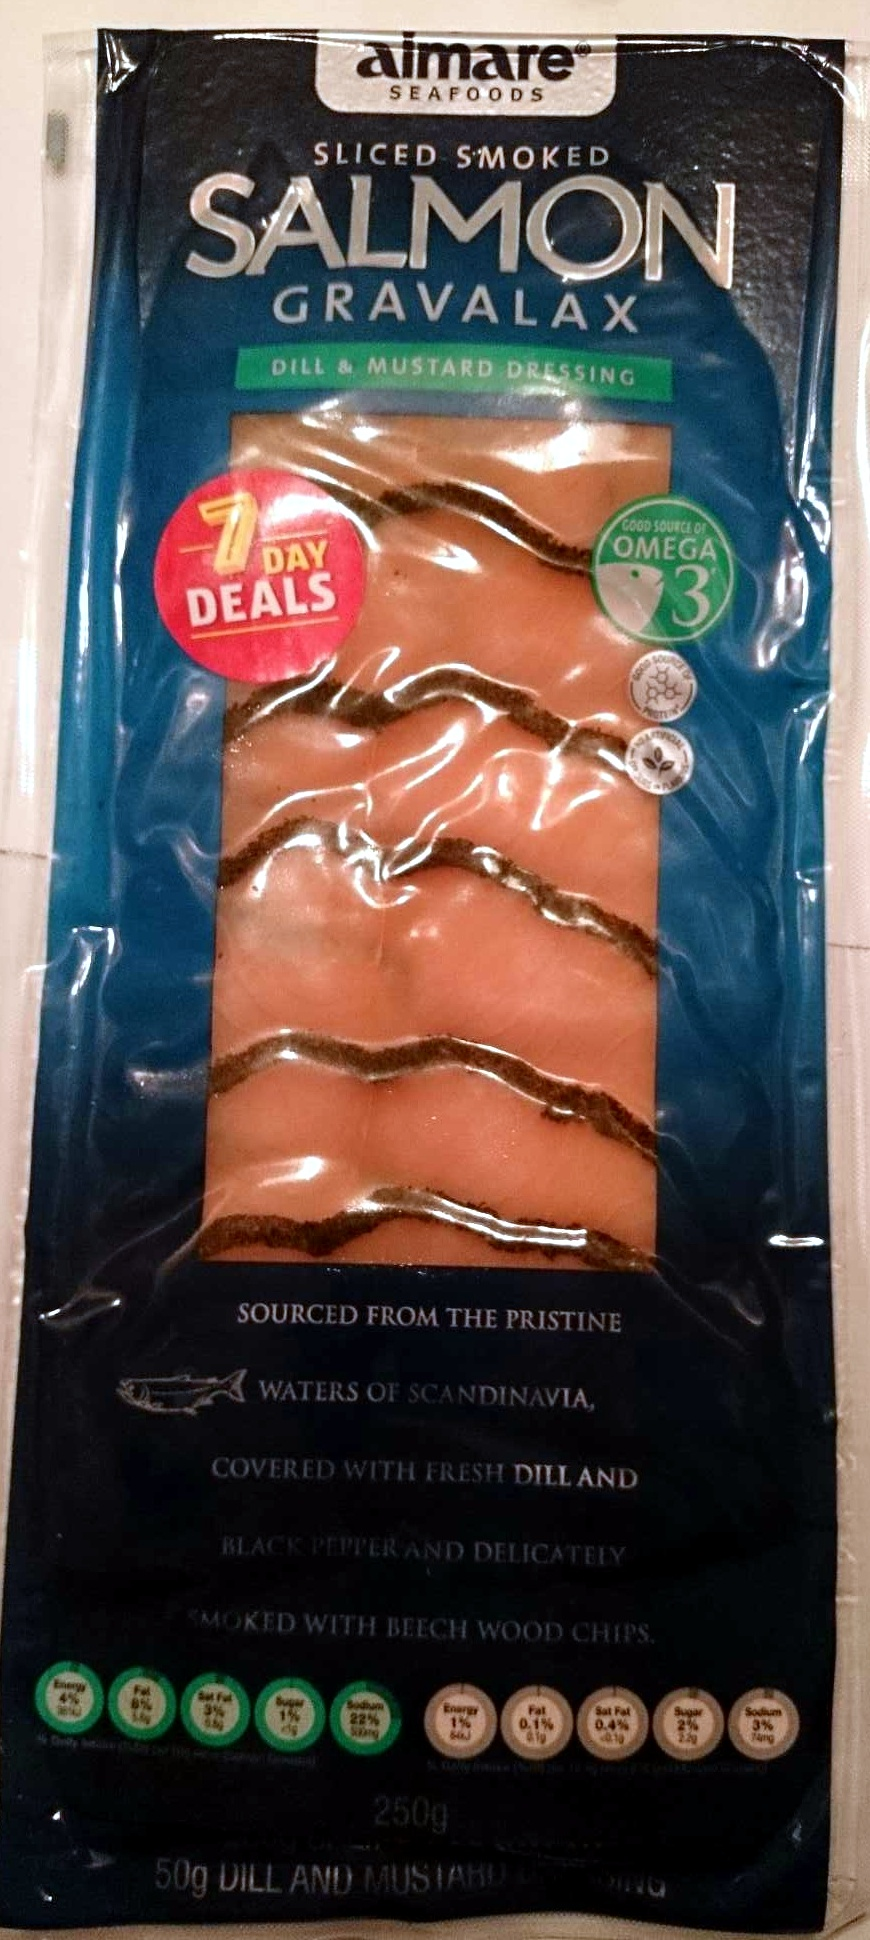 Sliced Smoke Salmon Gravalax - Dill & Mustard Dressing - Product - en